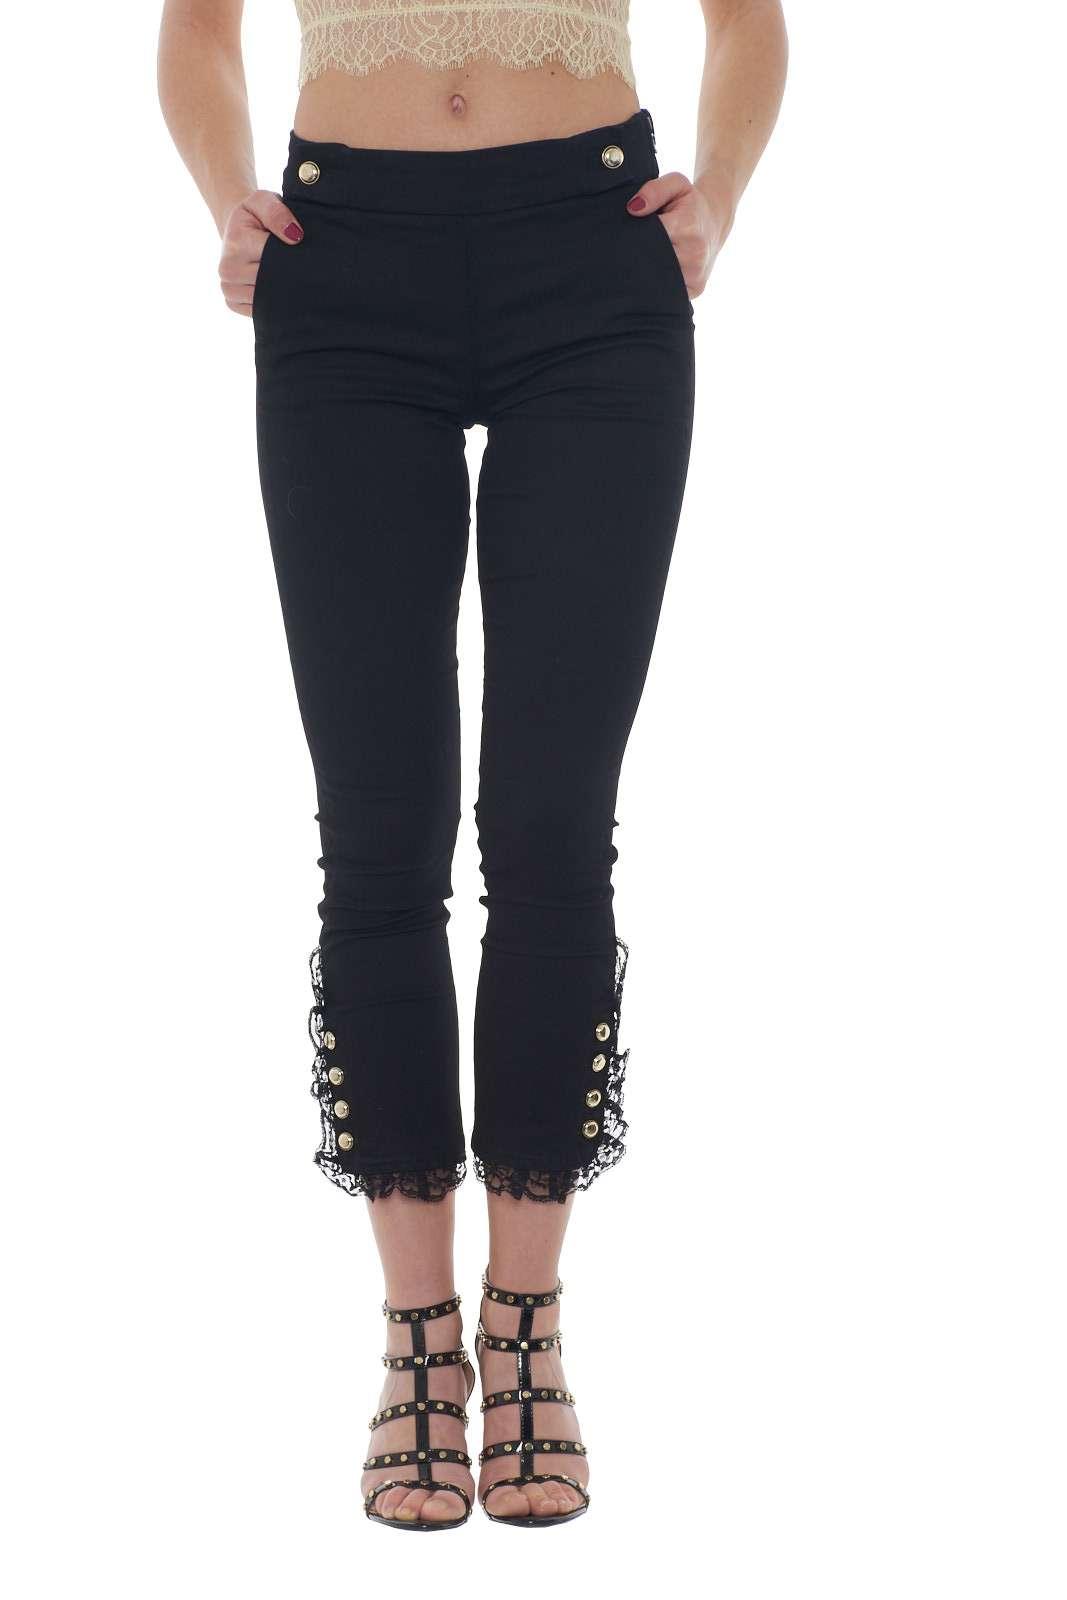 https://www.parmax.com/media/catalog/product/a/i/PE-outlet_parmax-pantaloni-donna-Liu-Jo-U18076-A.jpg